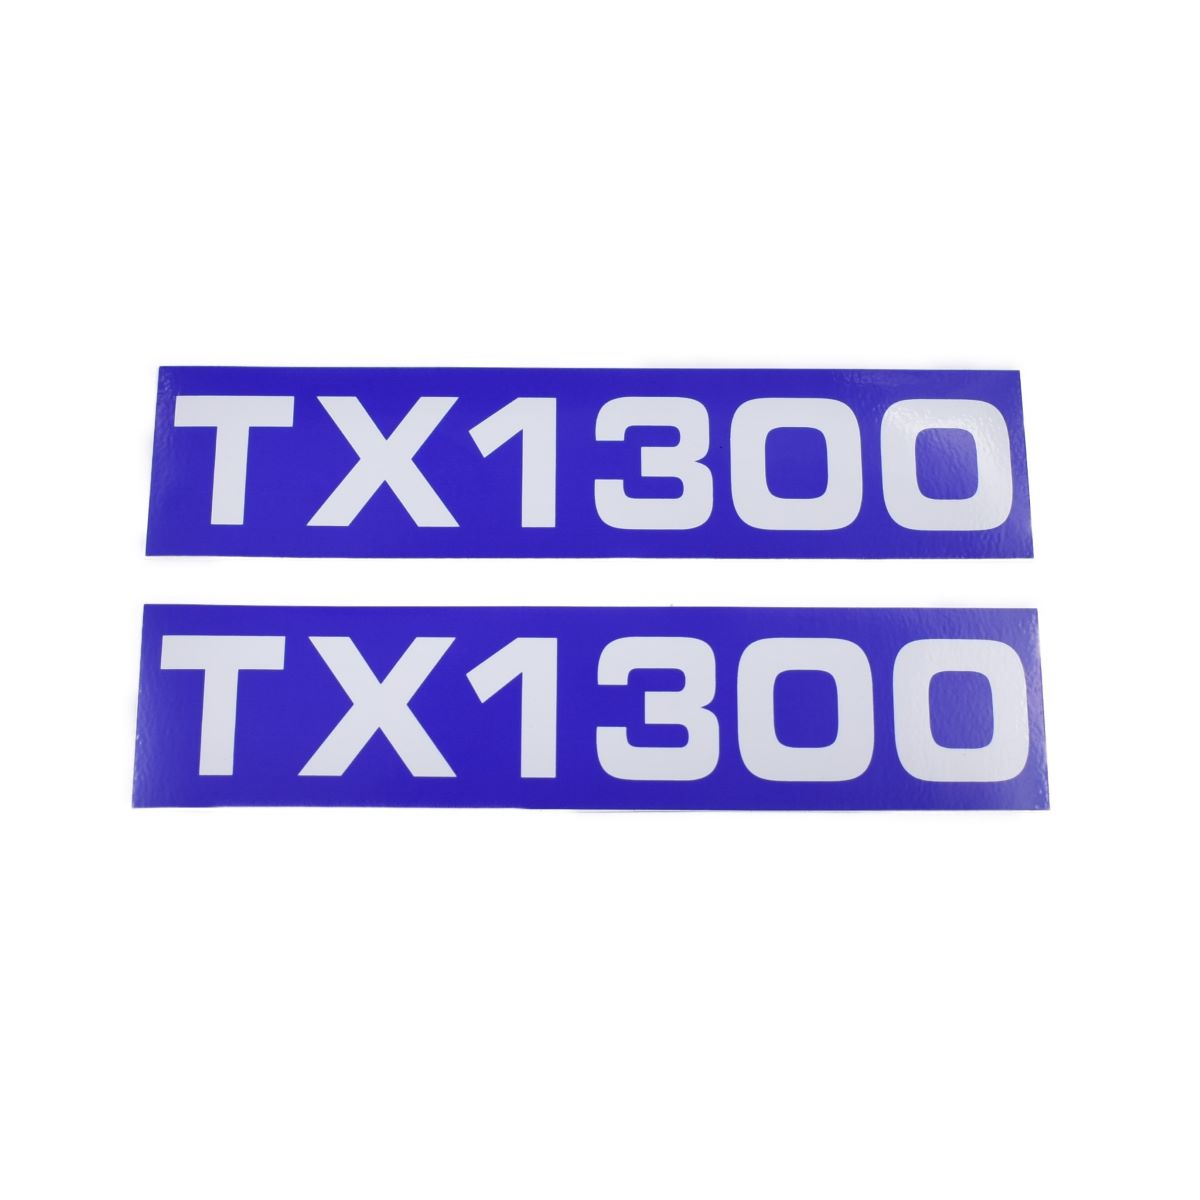 Sticker set Iseki TX1300